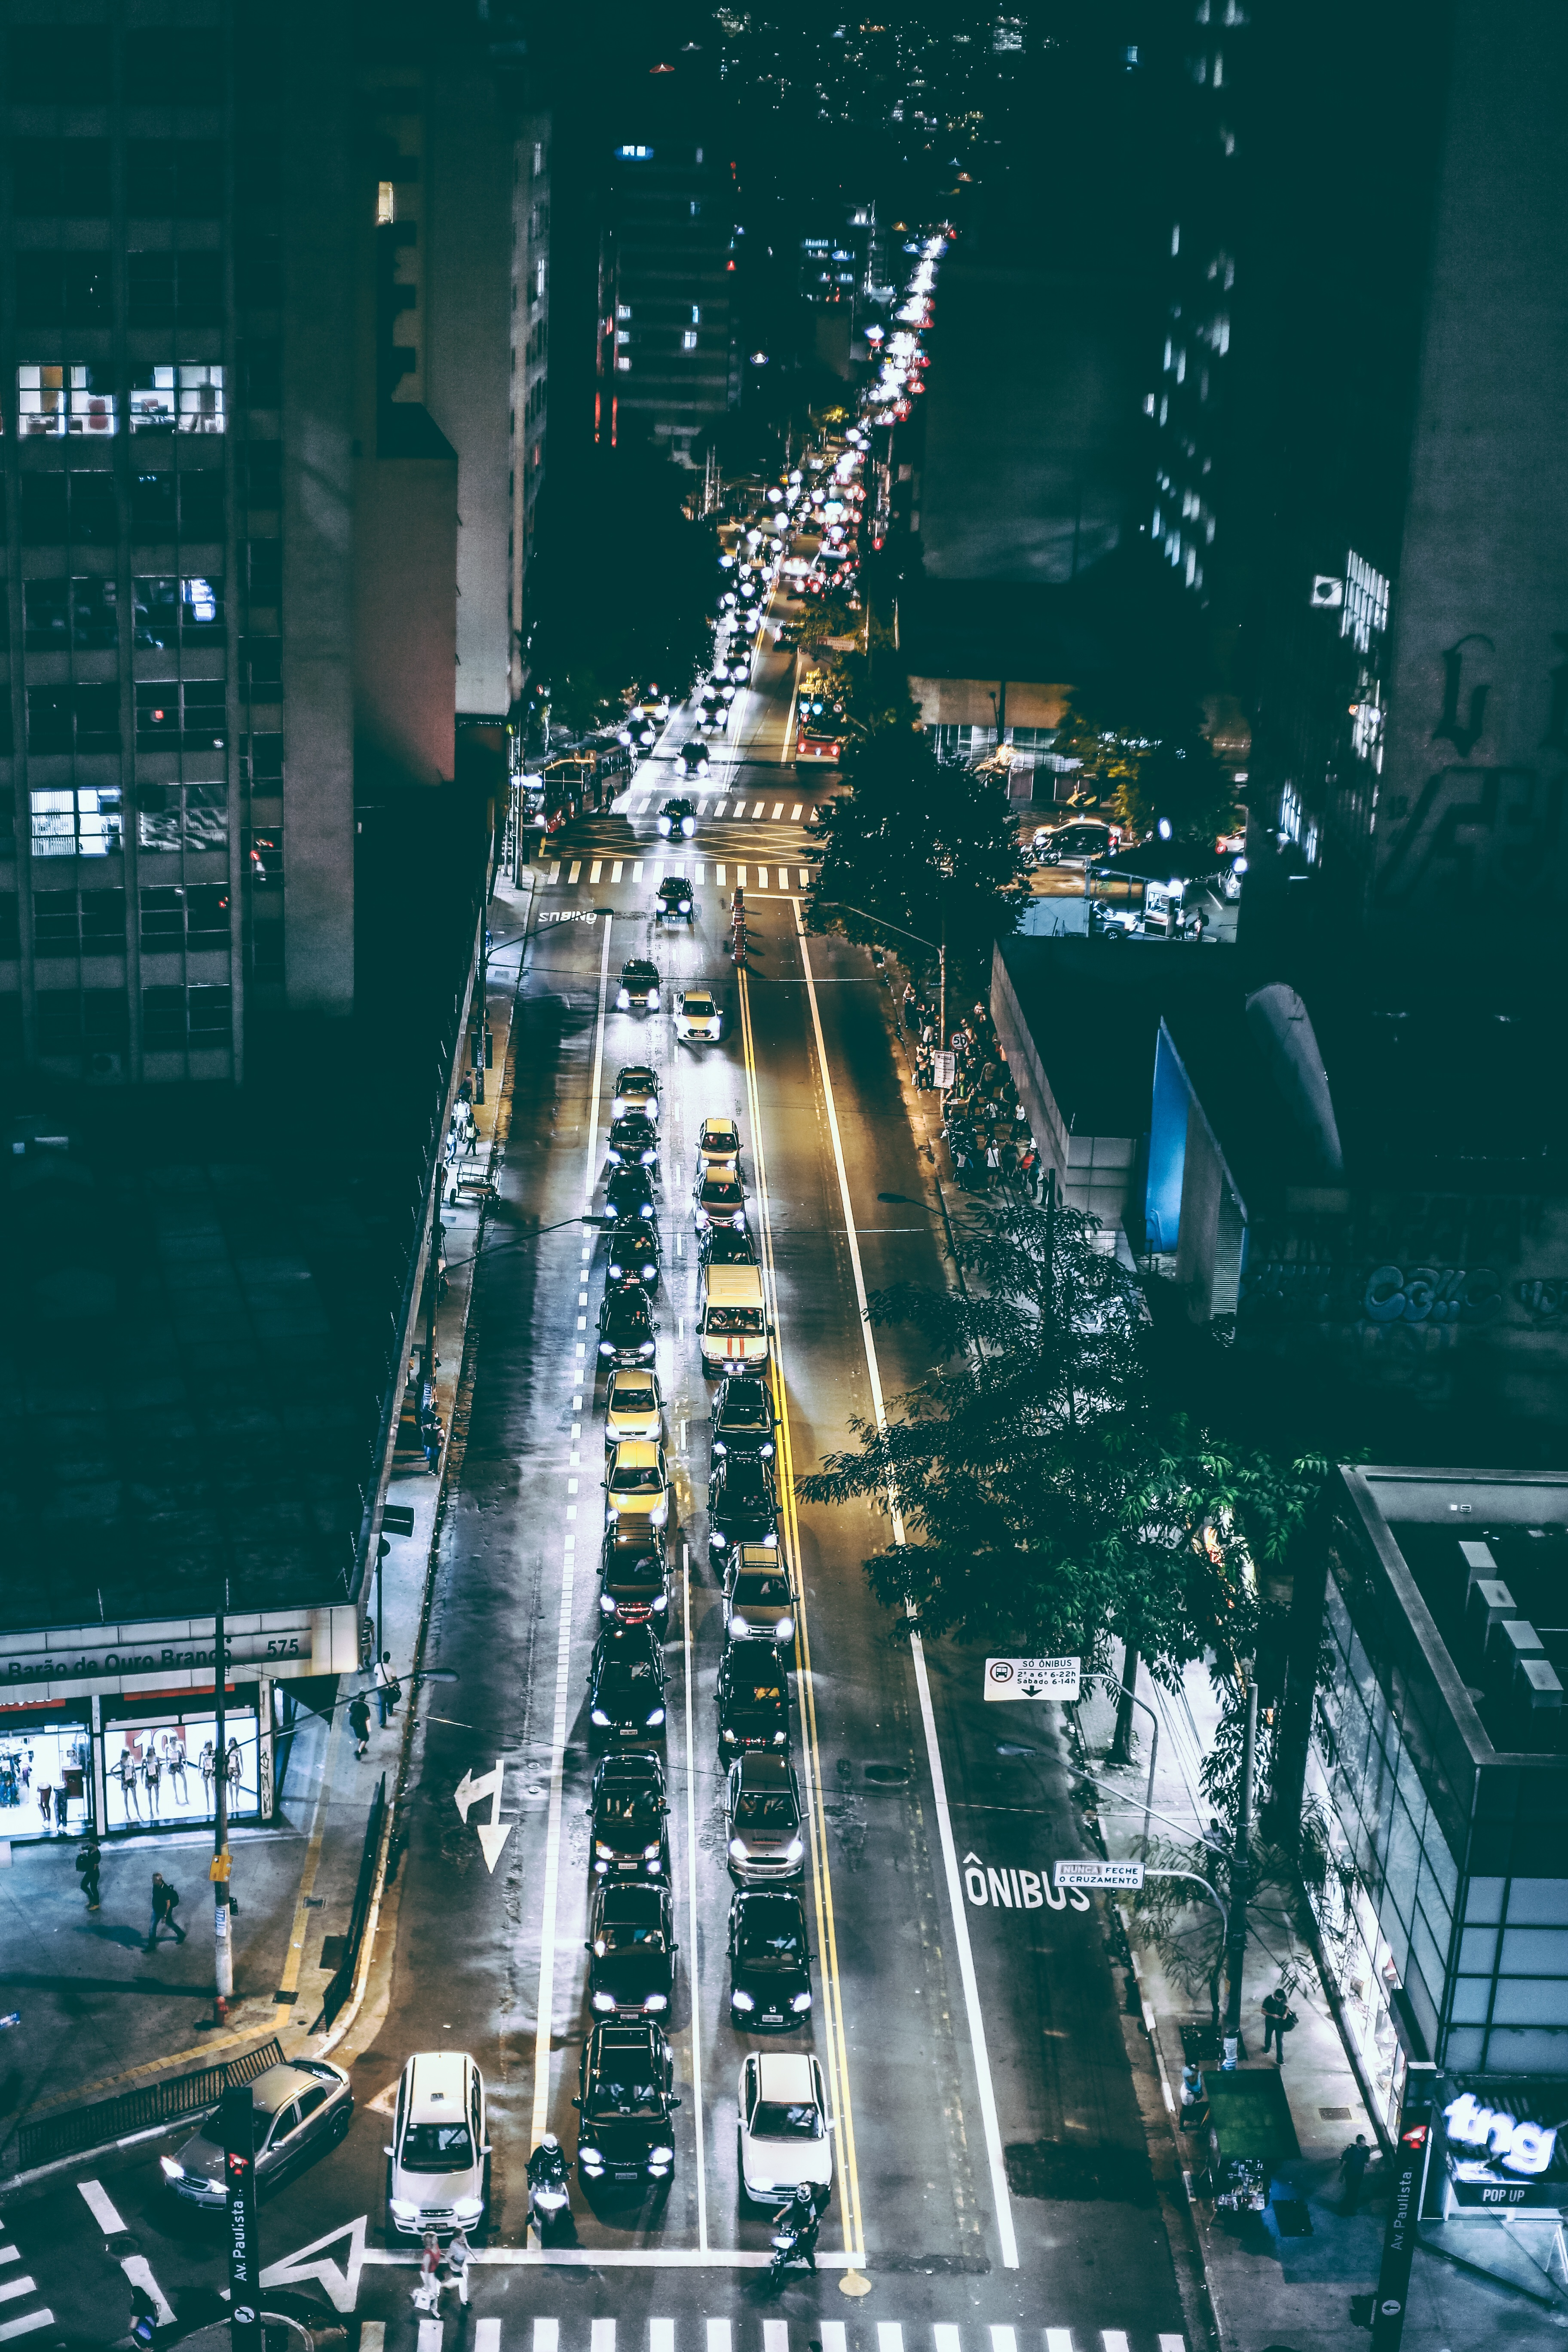 City Street, City, Night, Road, Street, HQ Photo